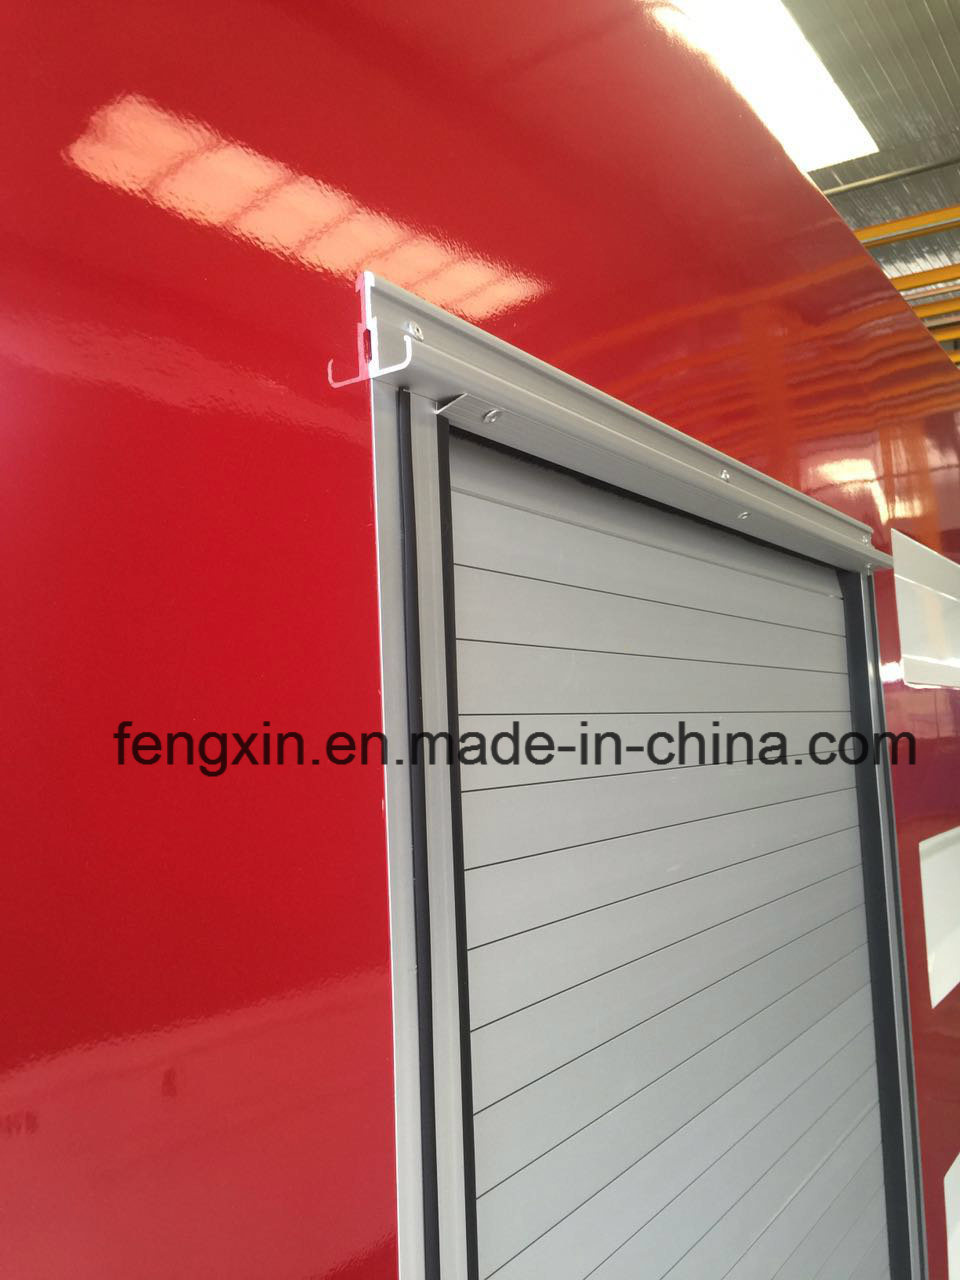 Aluminum Roller Shutter/Roll up Door for Fire-Fighting Truck